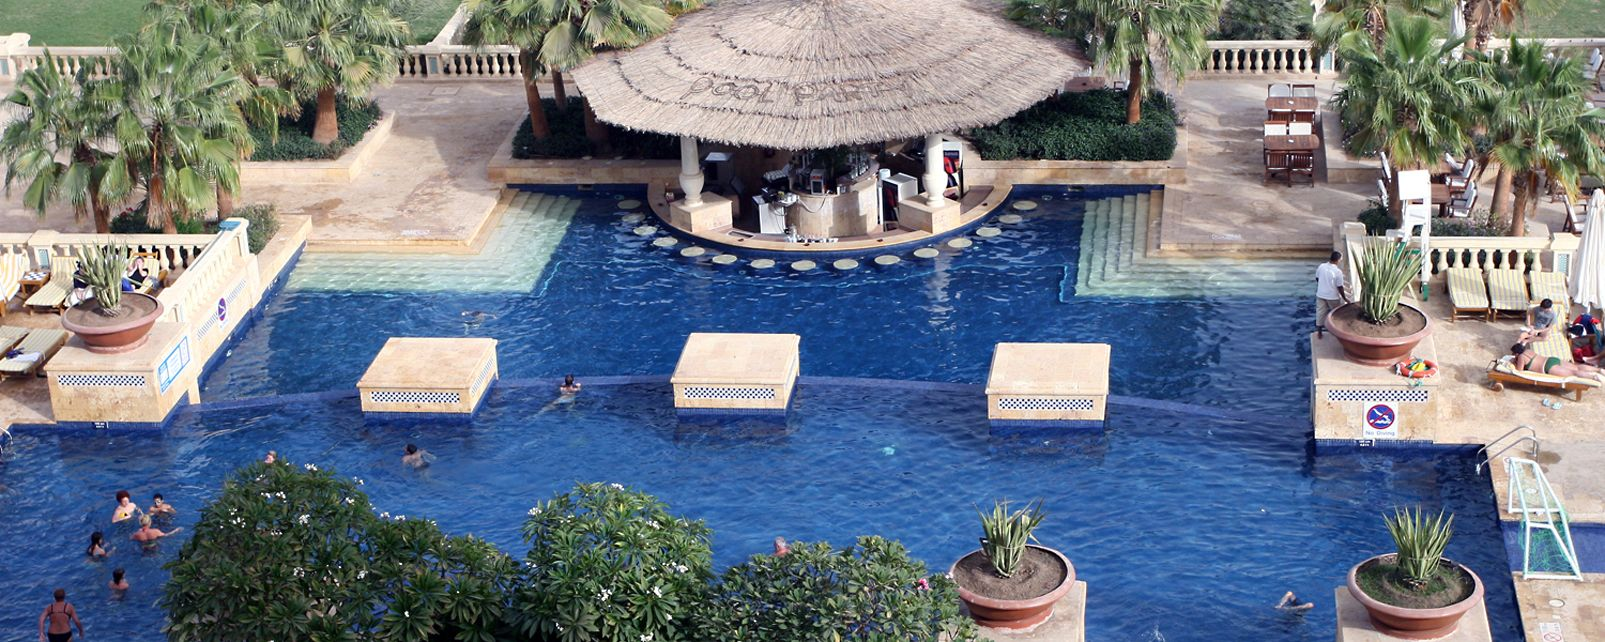 Hotel Sheraton Sharm el Sheikh